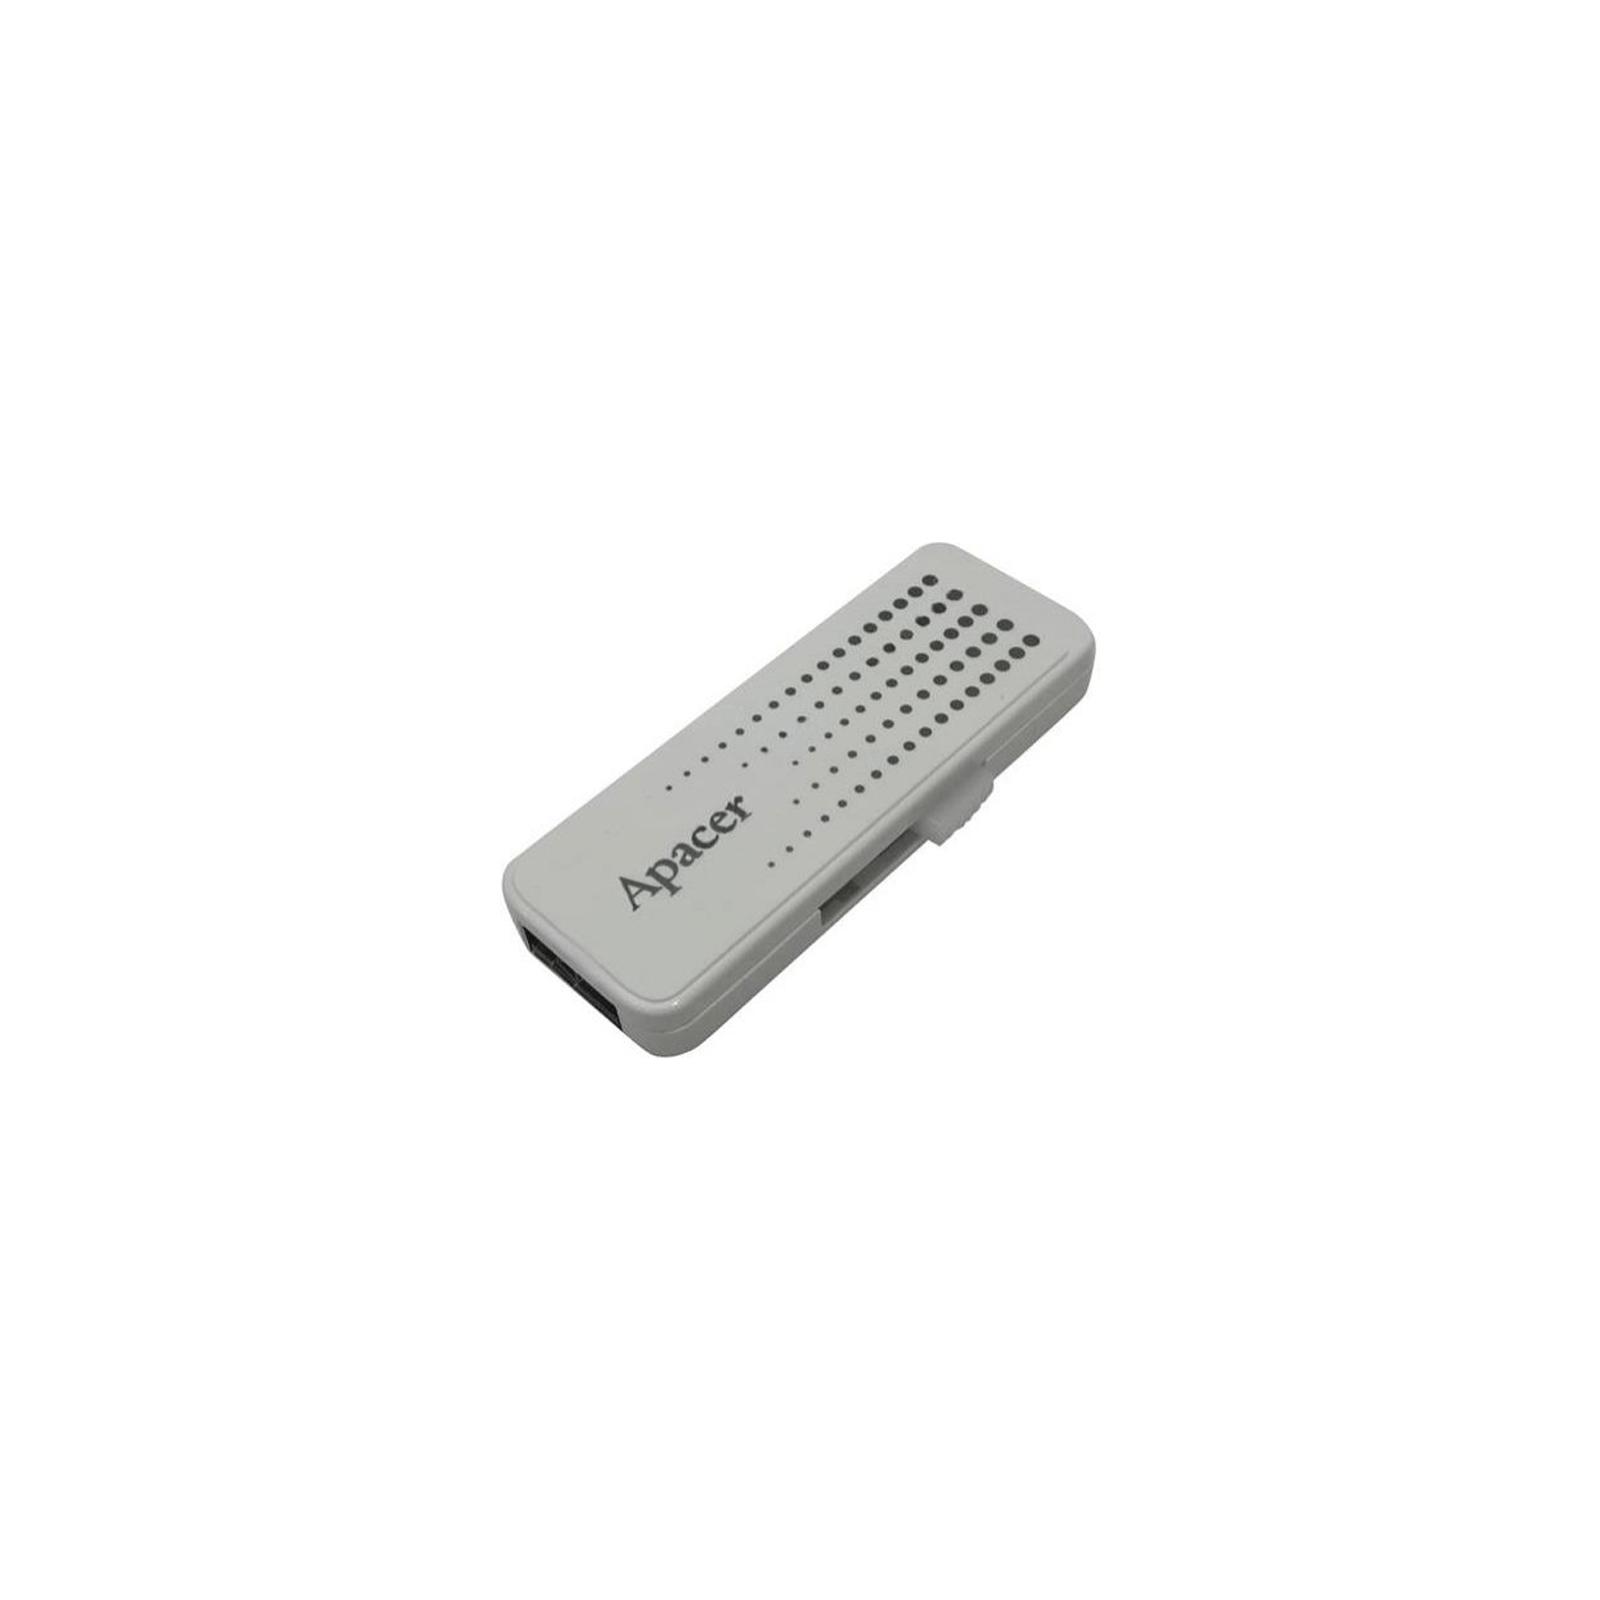 USB флеш накопитель Handy Steno AH323 white Apacer (AP8GAH323W-1) изображение 2